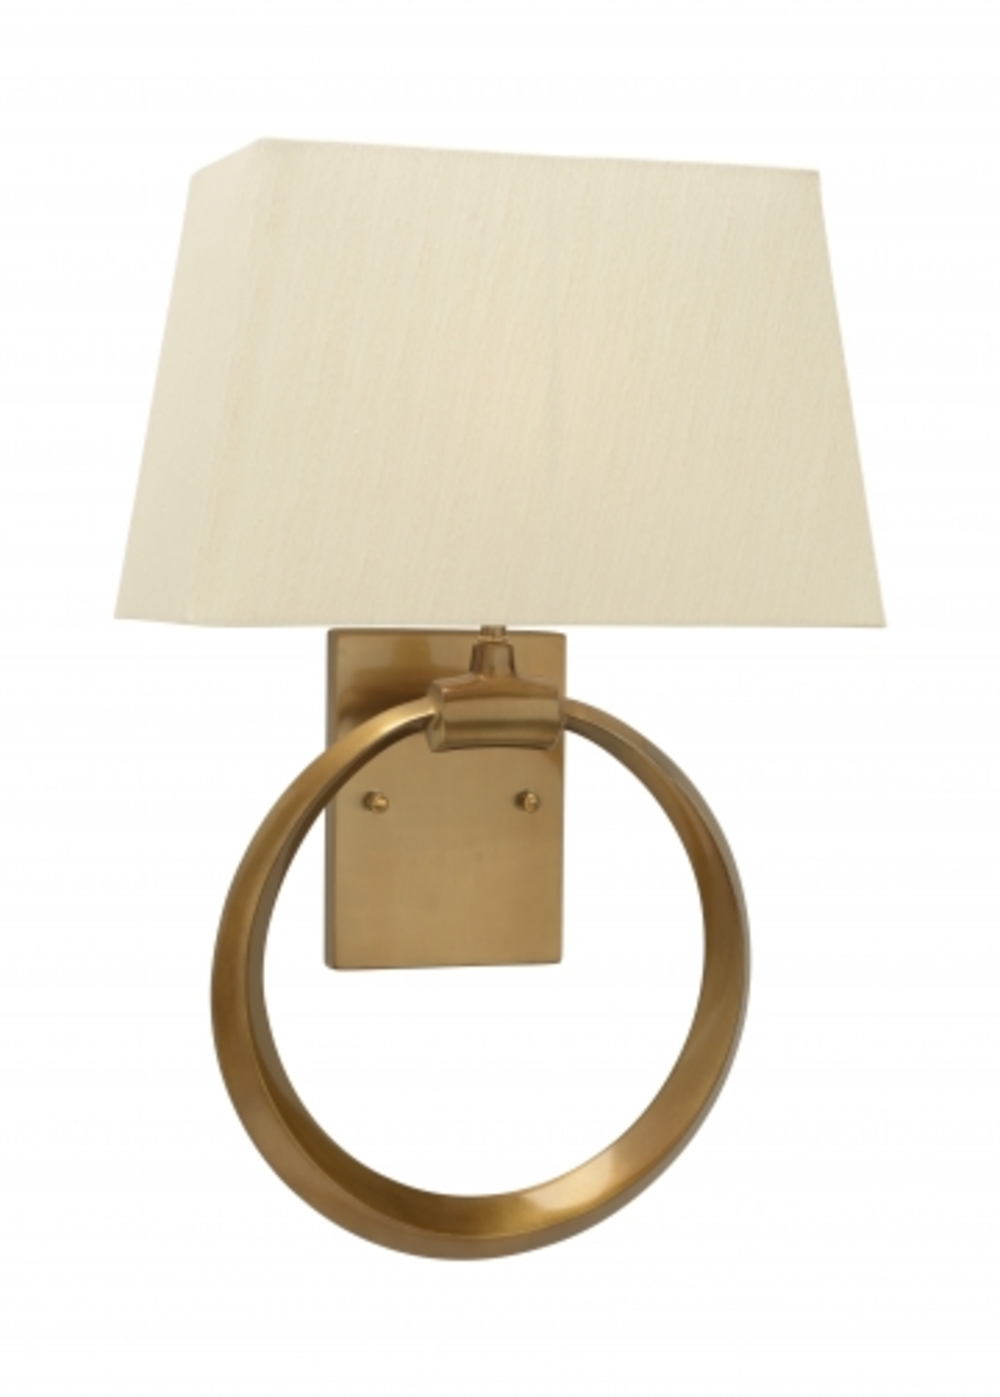 Wildwood Lamp - Ring Sconce